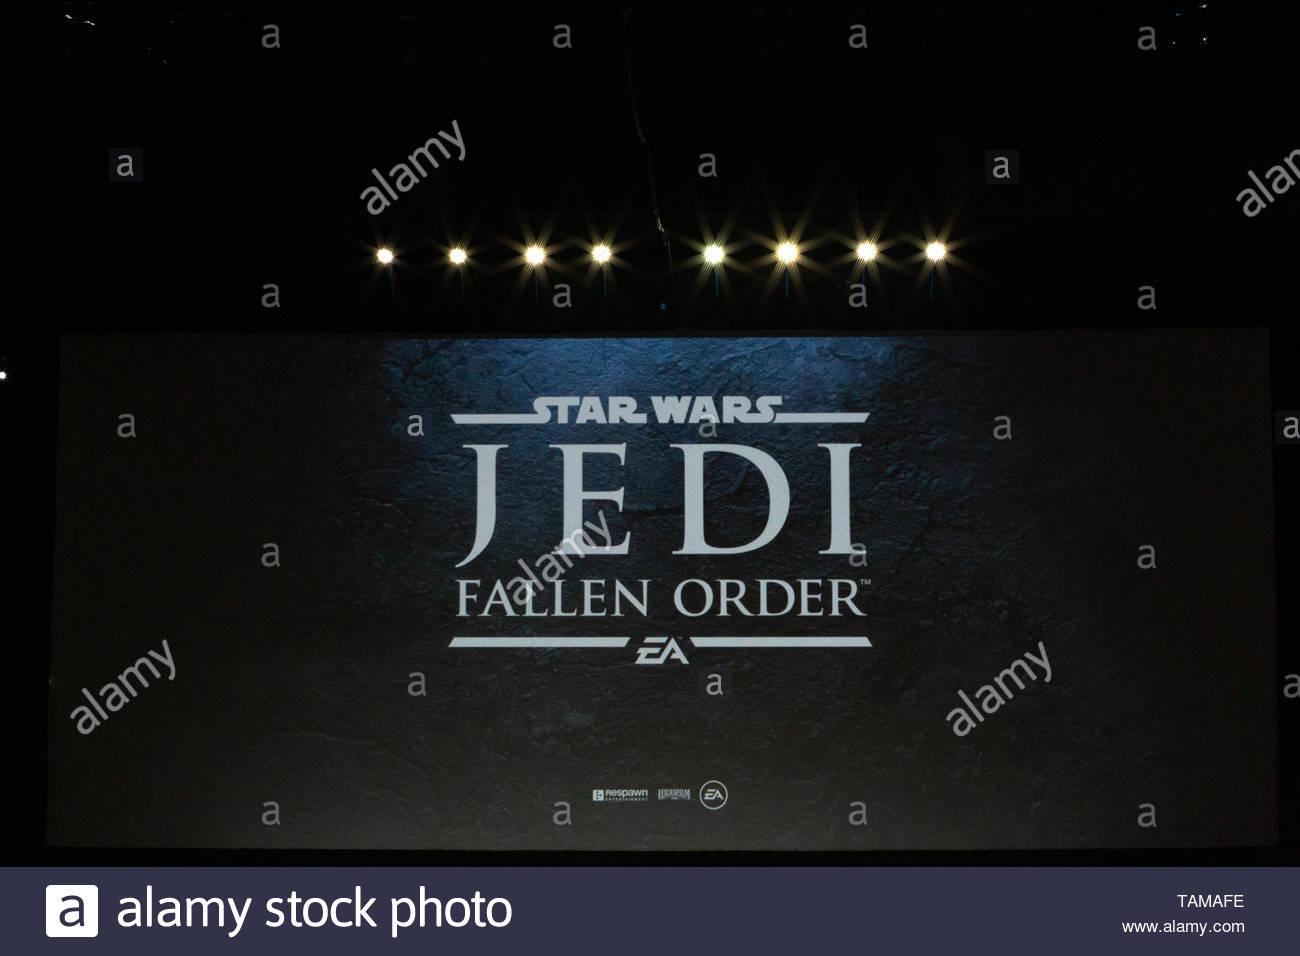 Free Download Star Wars Jedi Fallen Order Black Background Stock Photos Star 1300x956 For Your Desktop Mobile Tablet Explore 38 Star Wars Game Background Star Wars Game Background Star